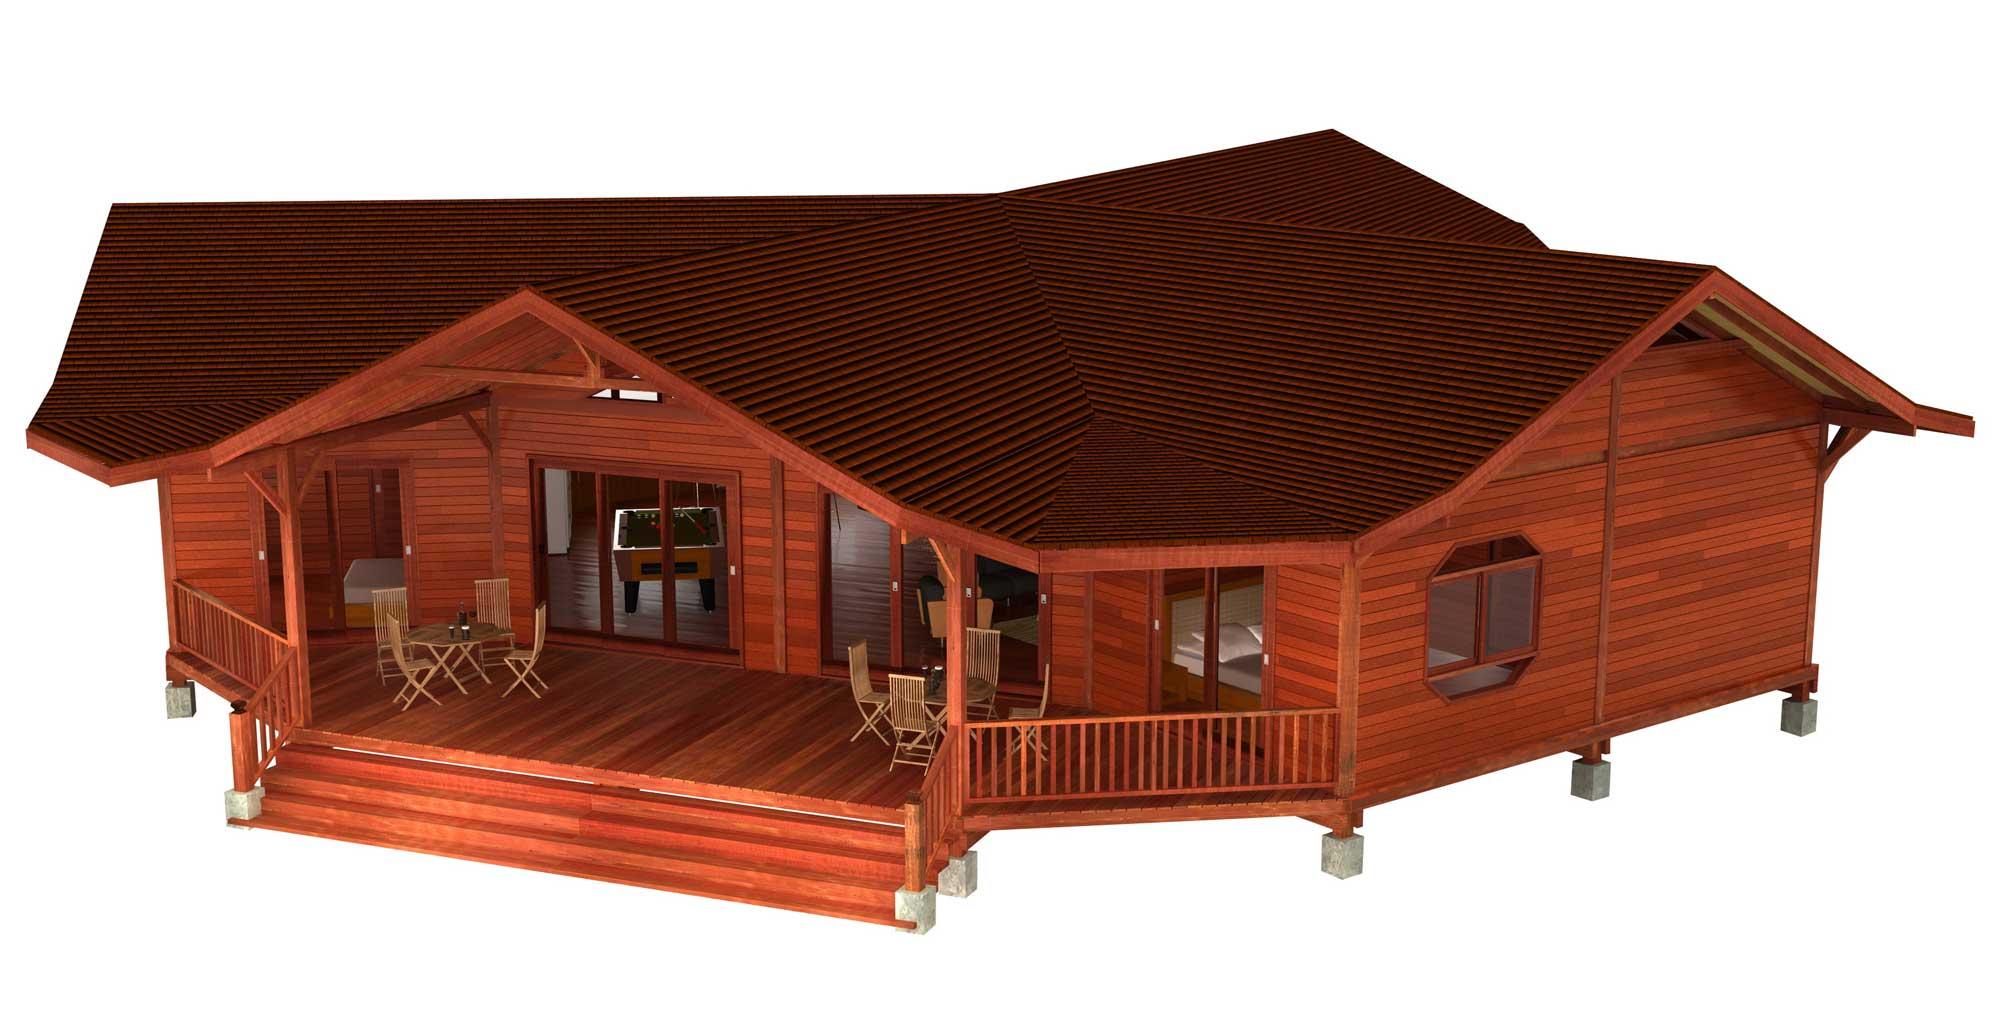 Tropical House Designs & Plans